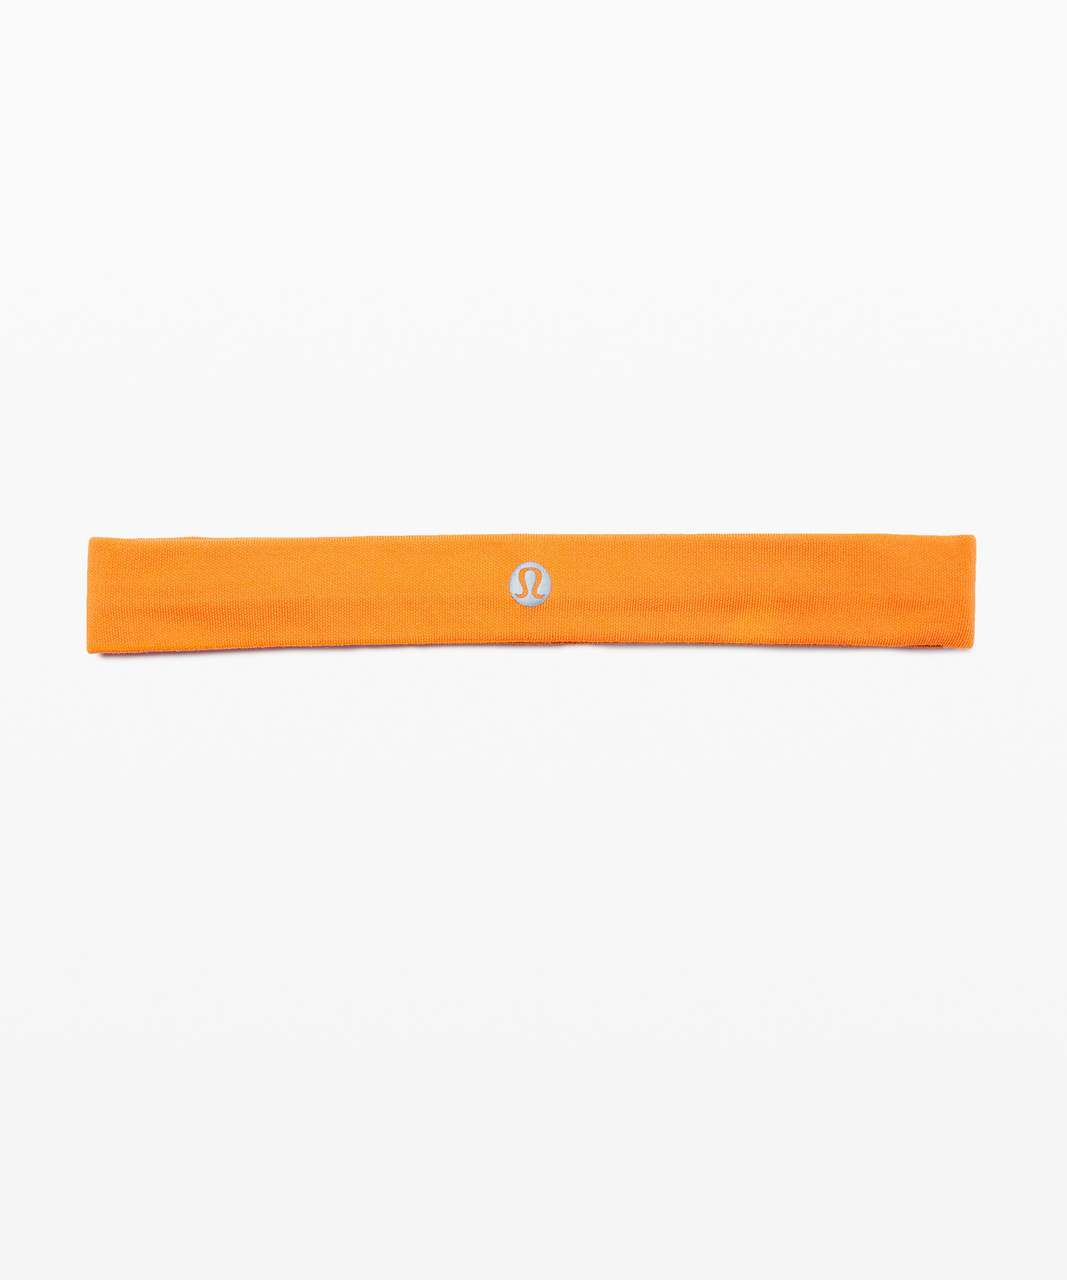 Lululemon Cardio Cross Trainer Headband - Tiger / Tiger